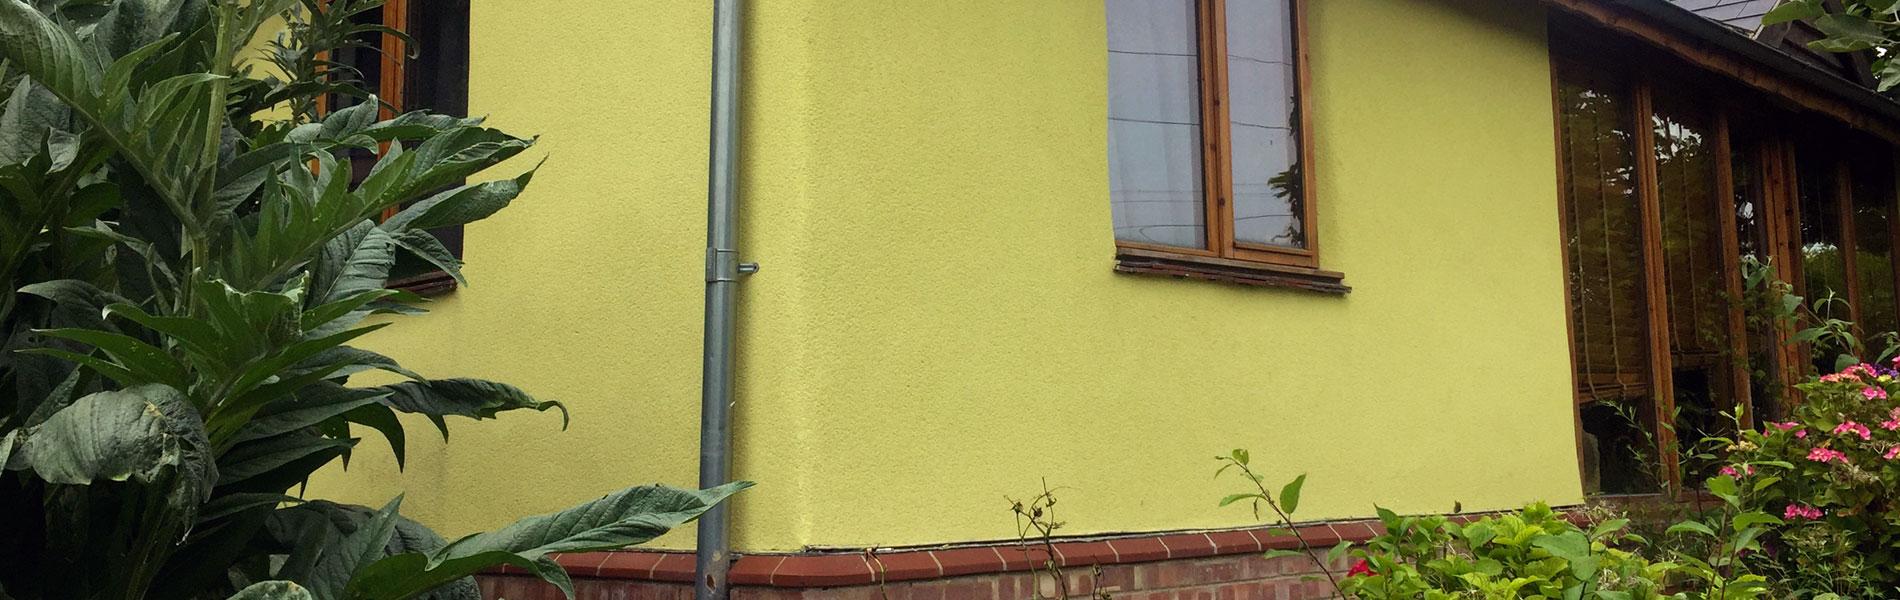 Eco-rendering-on-Hempcrete home